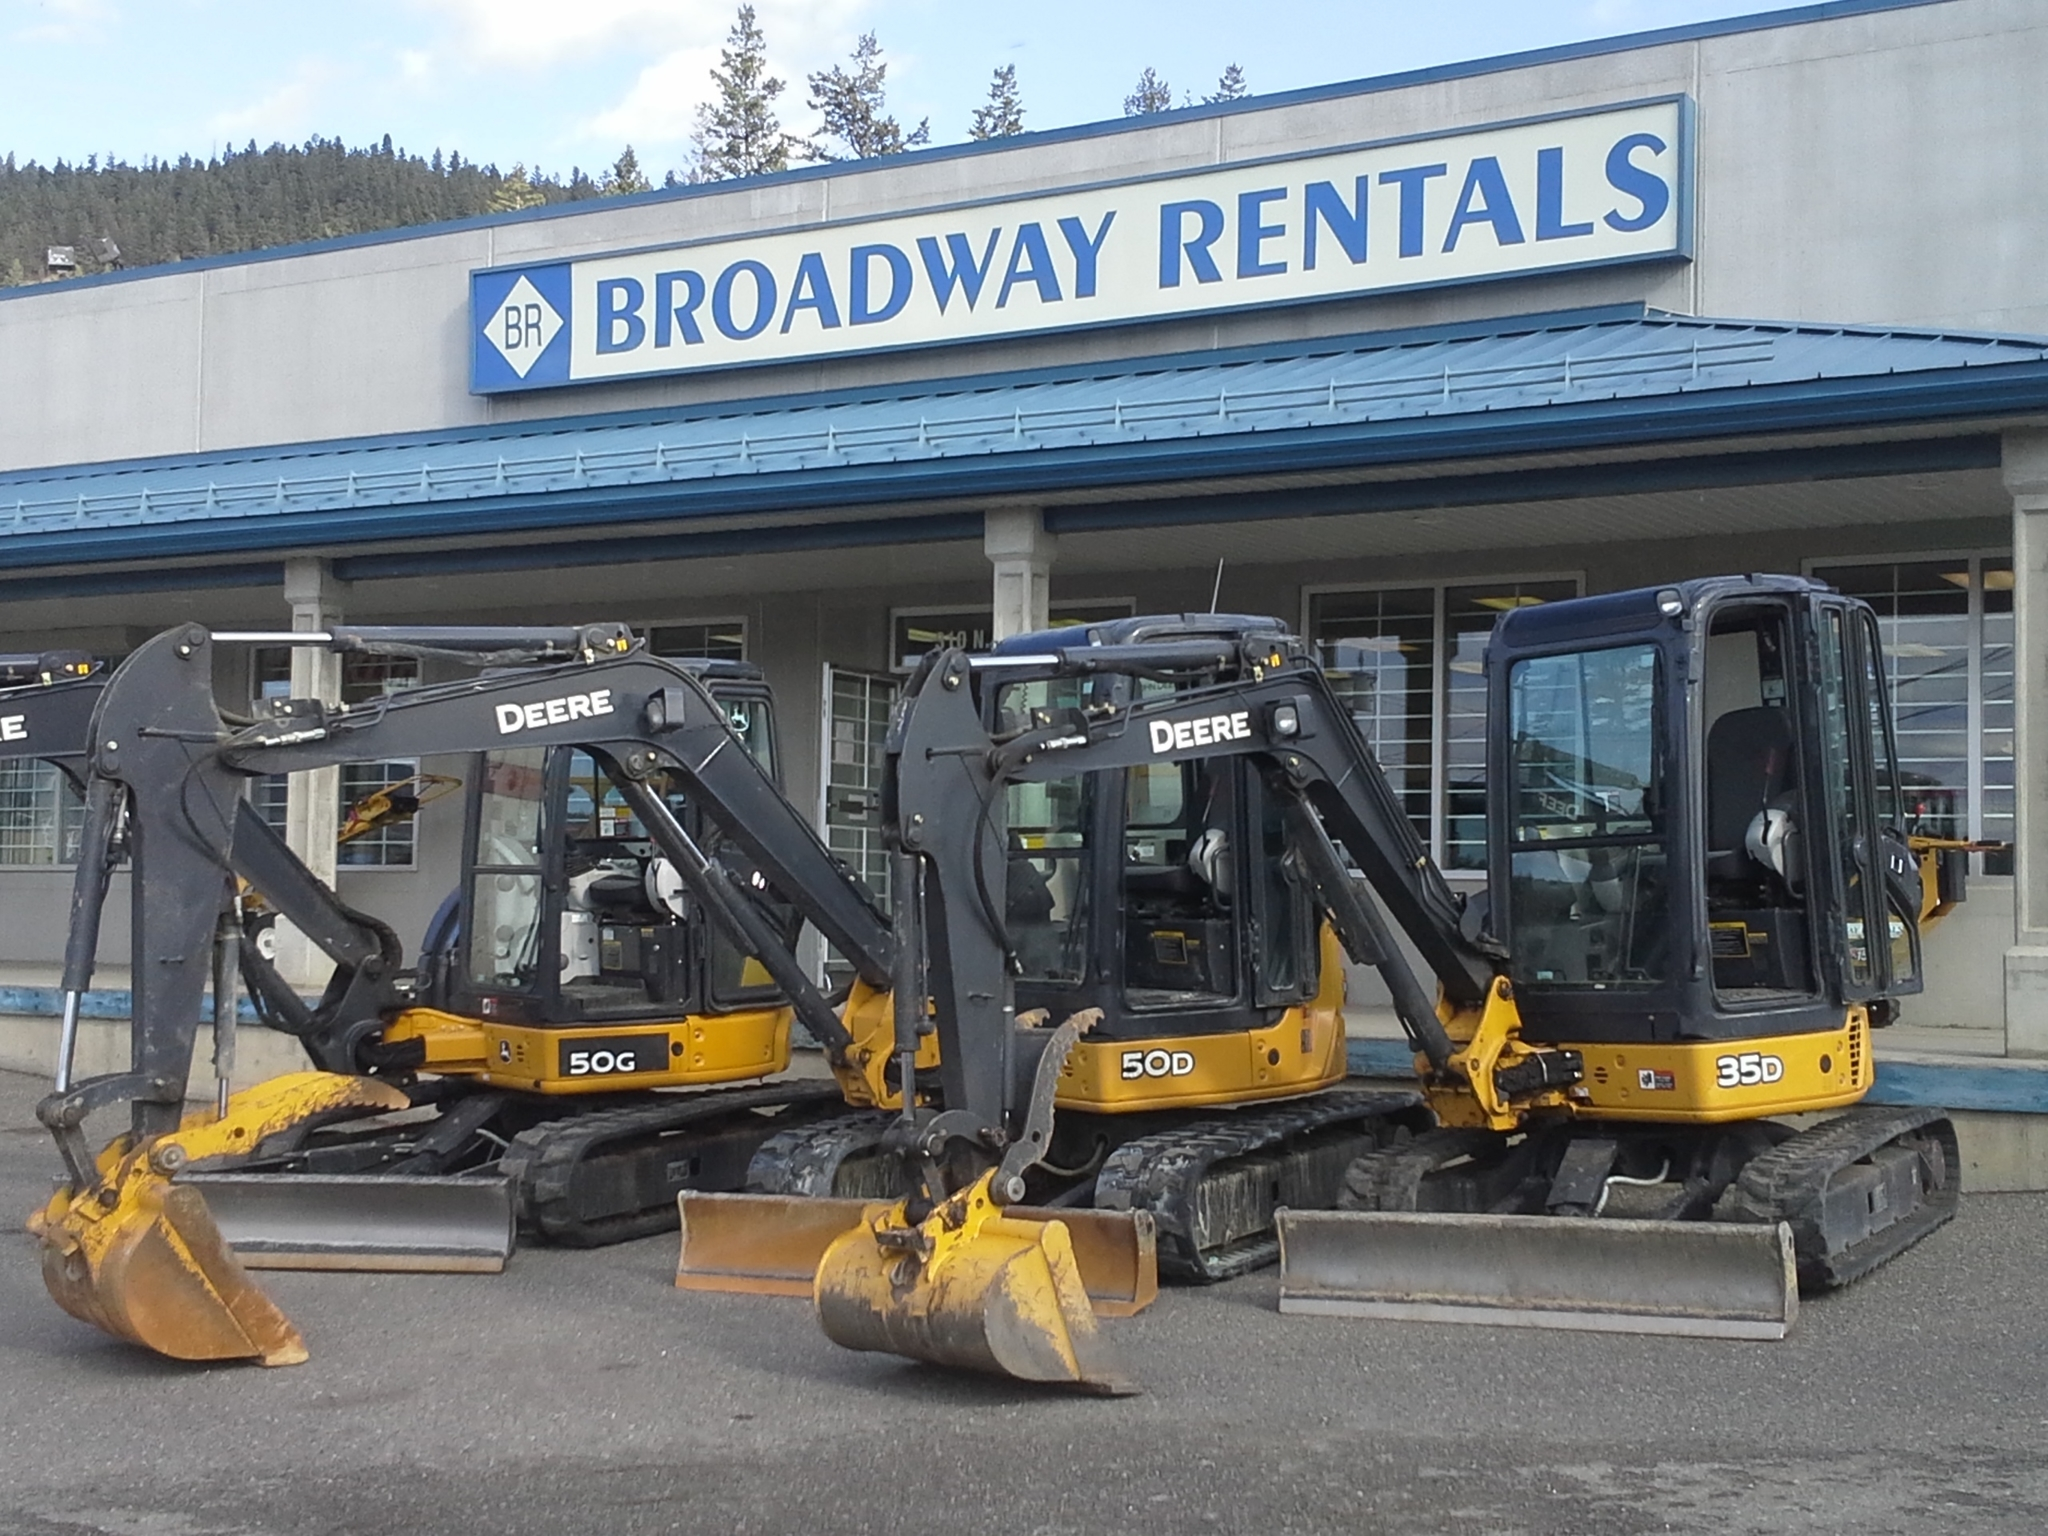 Broadway Rentals in Williams Lake: 3 mini excavators